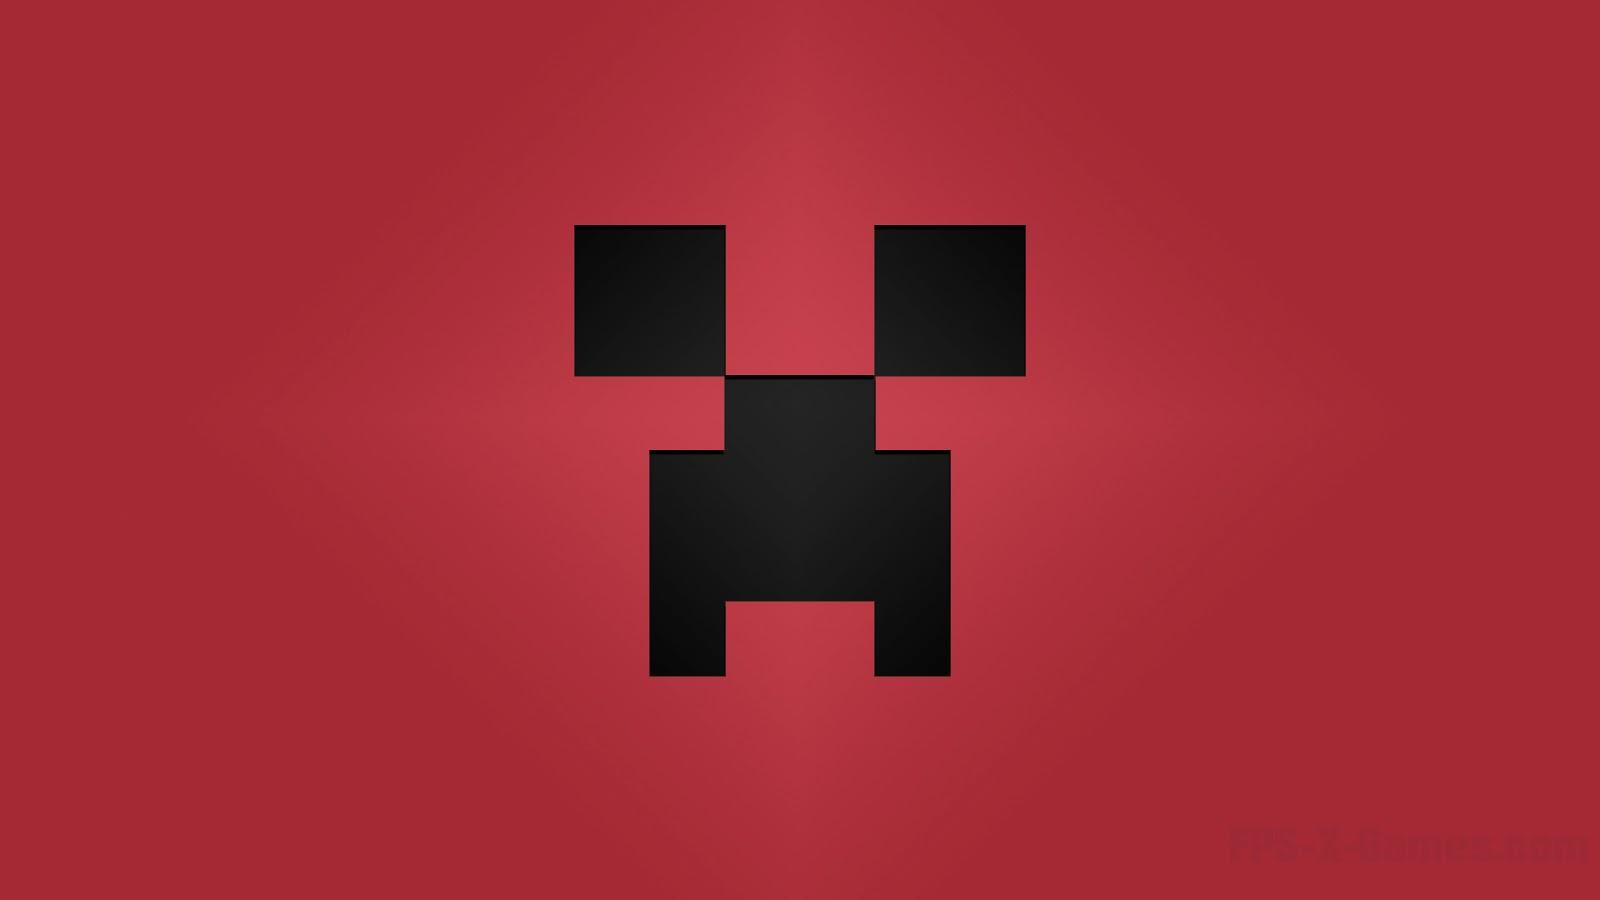 Minecraft Creeper desktop wallpapers red